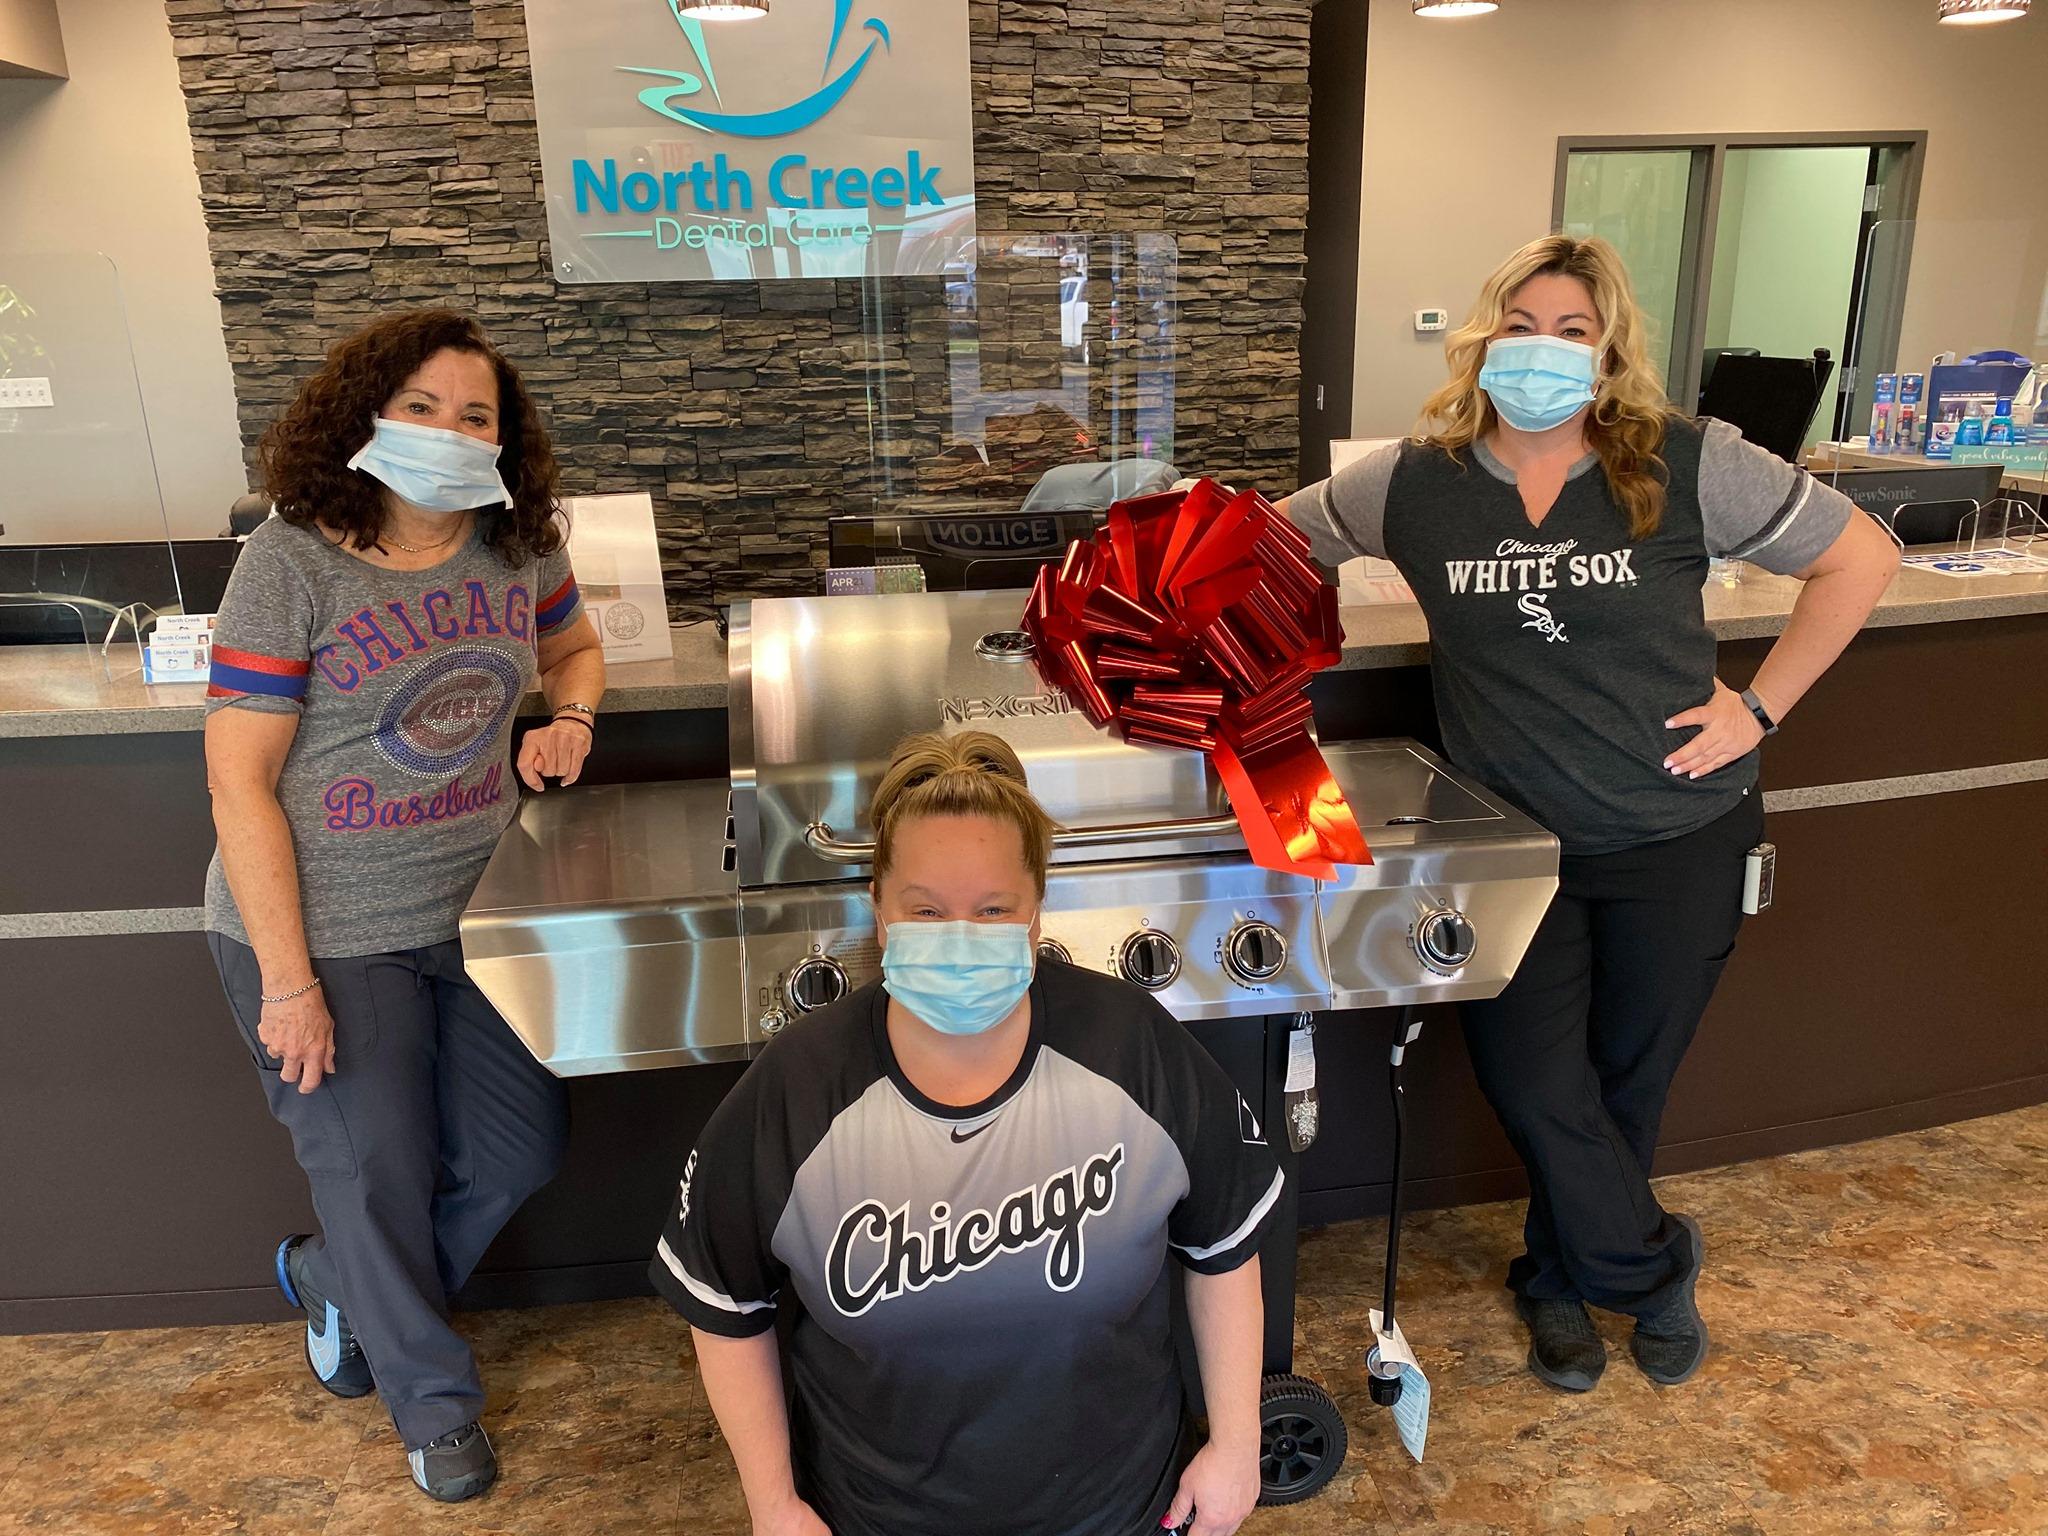 North Creek Dental Care - dentist  | Photo 5 of 6 | Address: 18425 W Creek Dr, Tinley Park, IL 60477, USA | Phone: (708) 532-4131